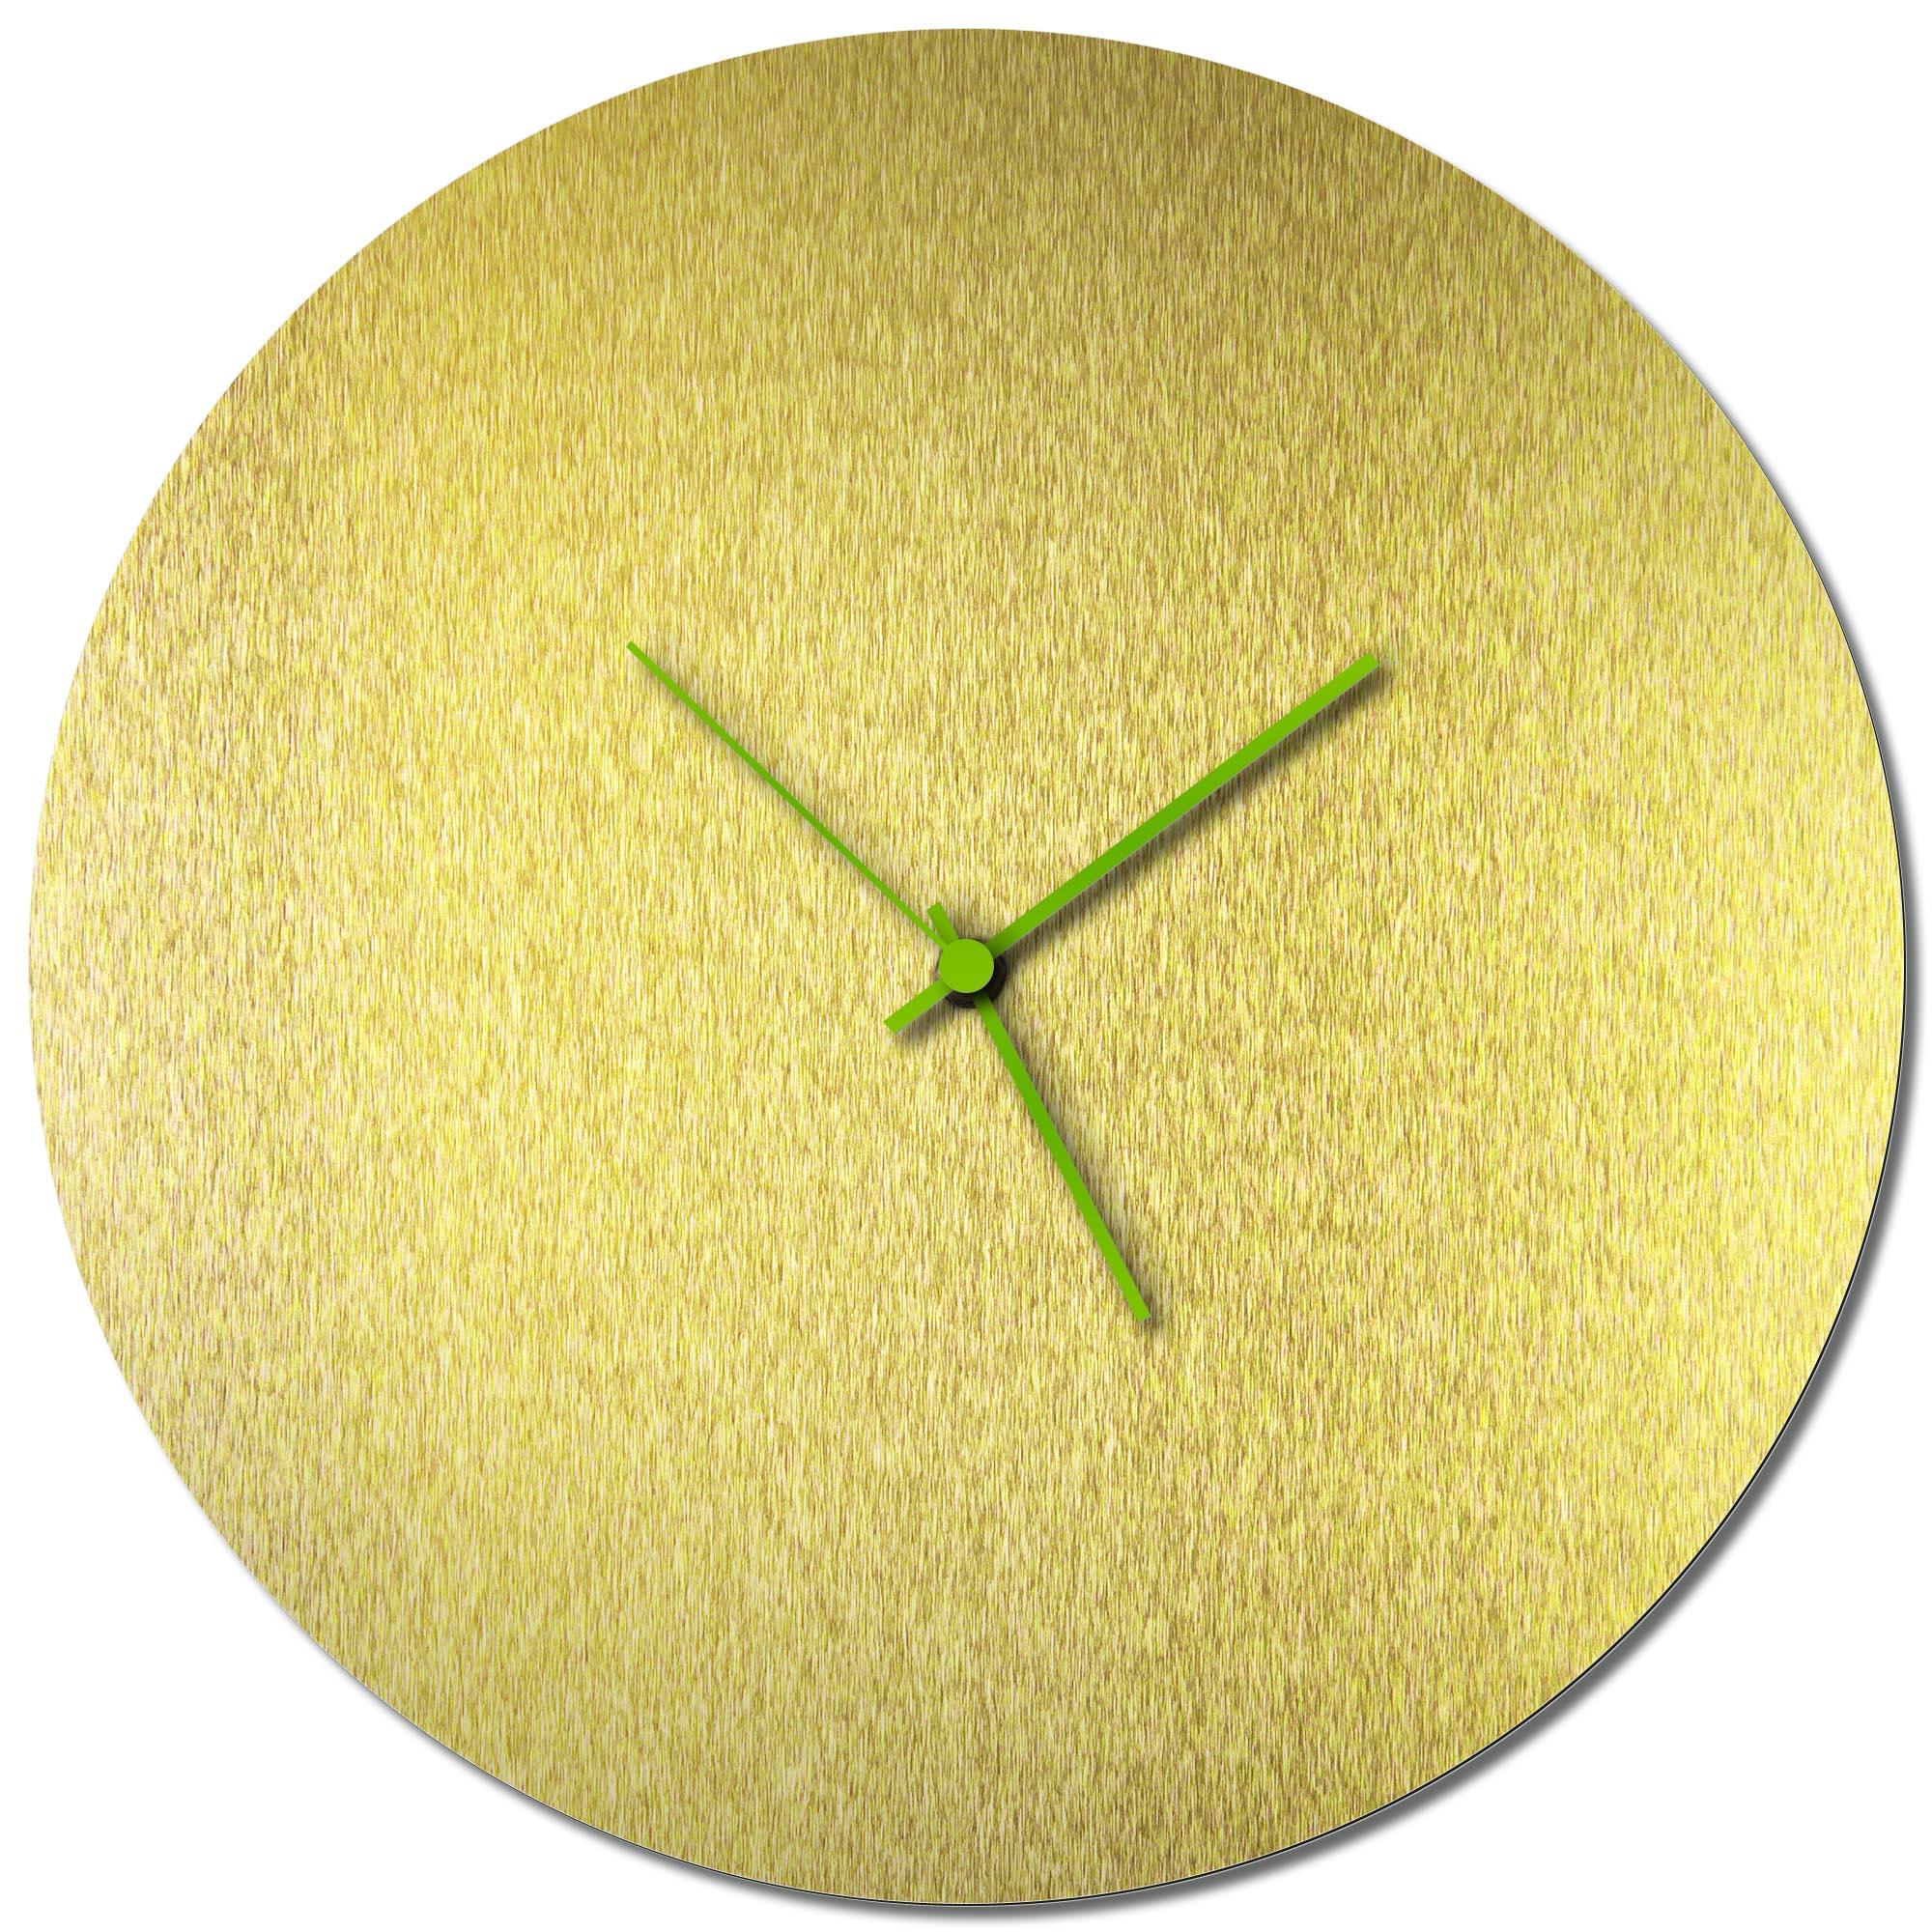 Adam Schwoeppe 'Goldsmith Circle Clock Green' Midcentury Modern Style Wall Clock